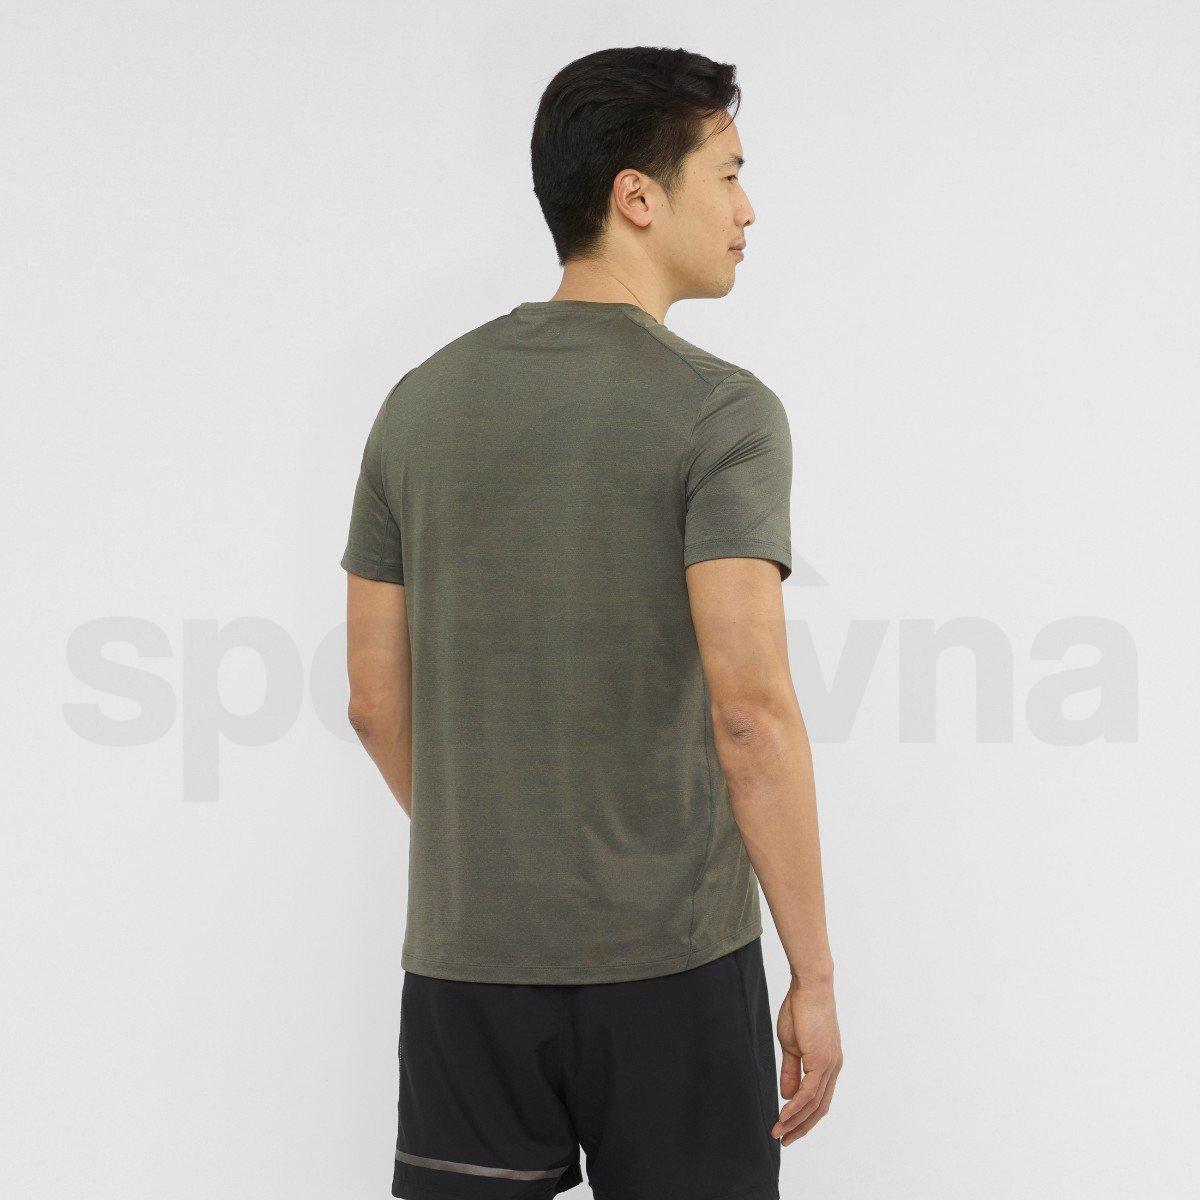 Tričko Salomon XA TEE M - zelená